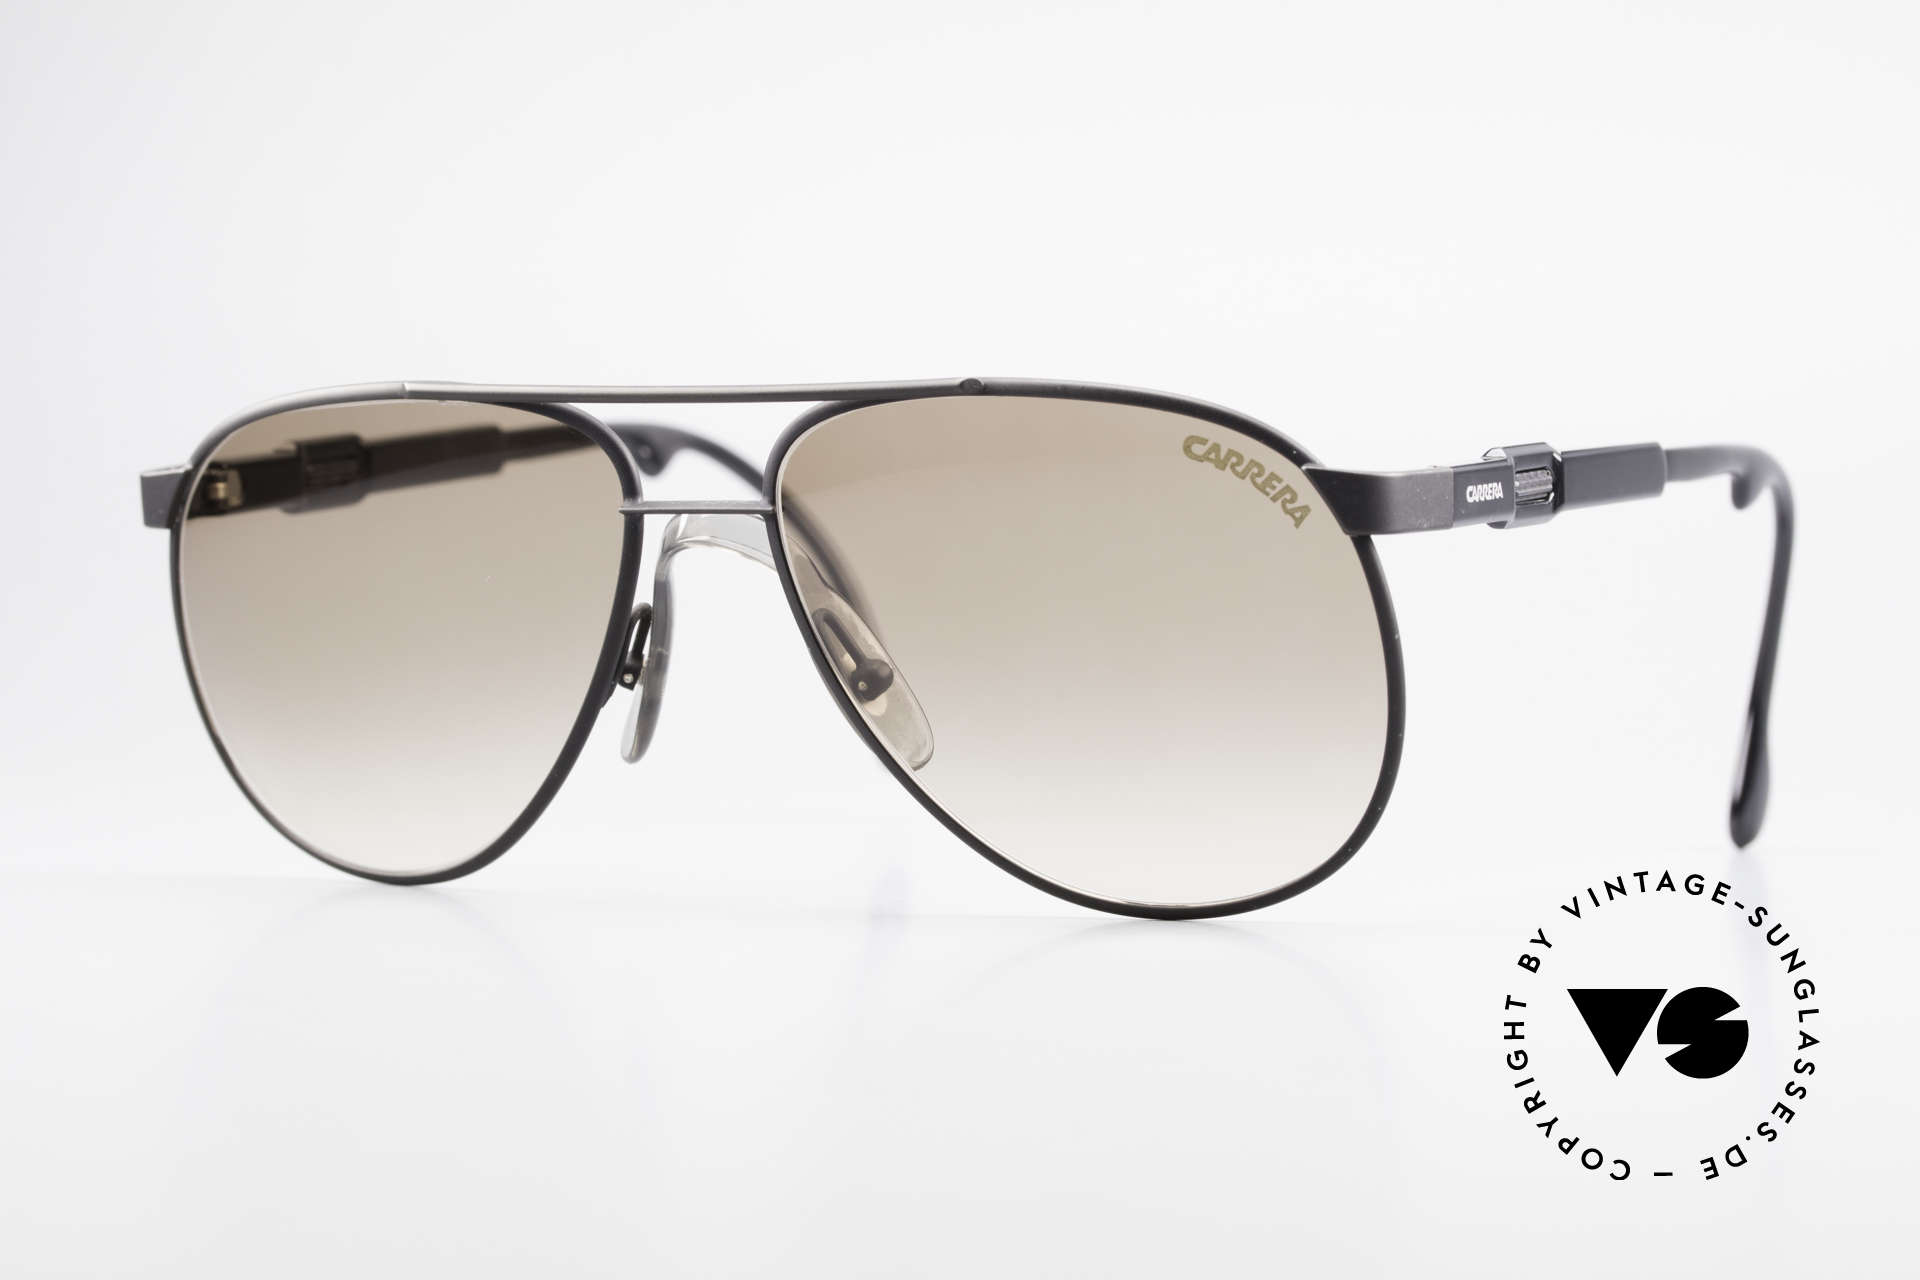 Carrera 5348 Vario Sports Sunglasses 80's, brilliant vintage Carrera 80s sunglasses, size 56°15, Made for Men and Women